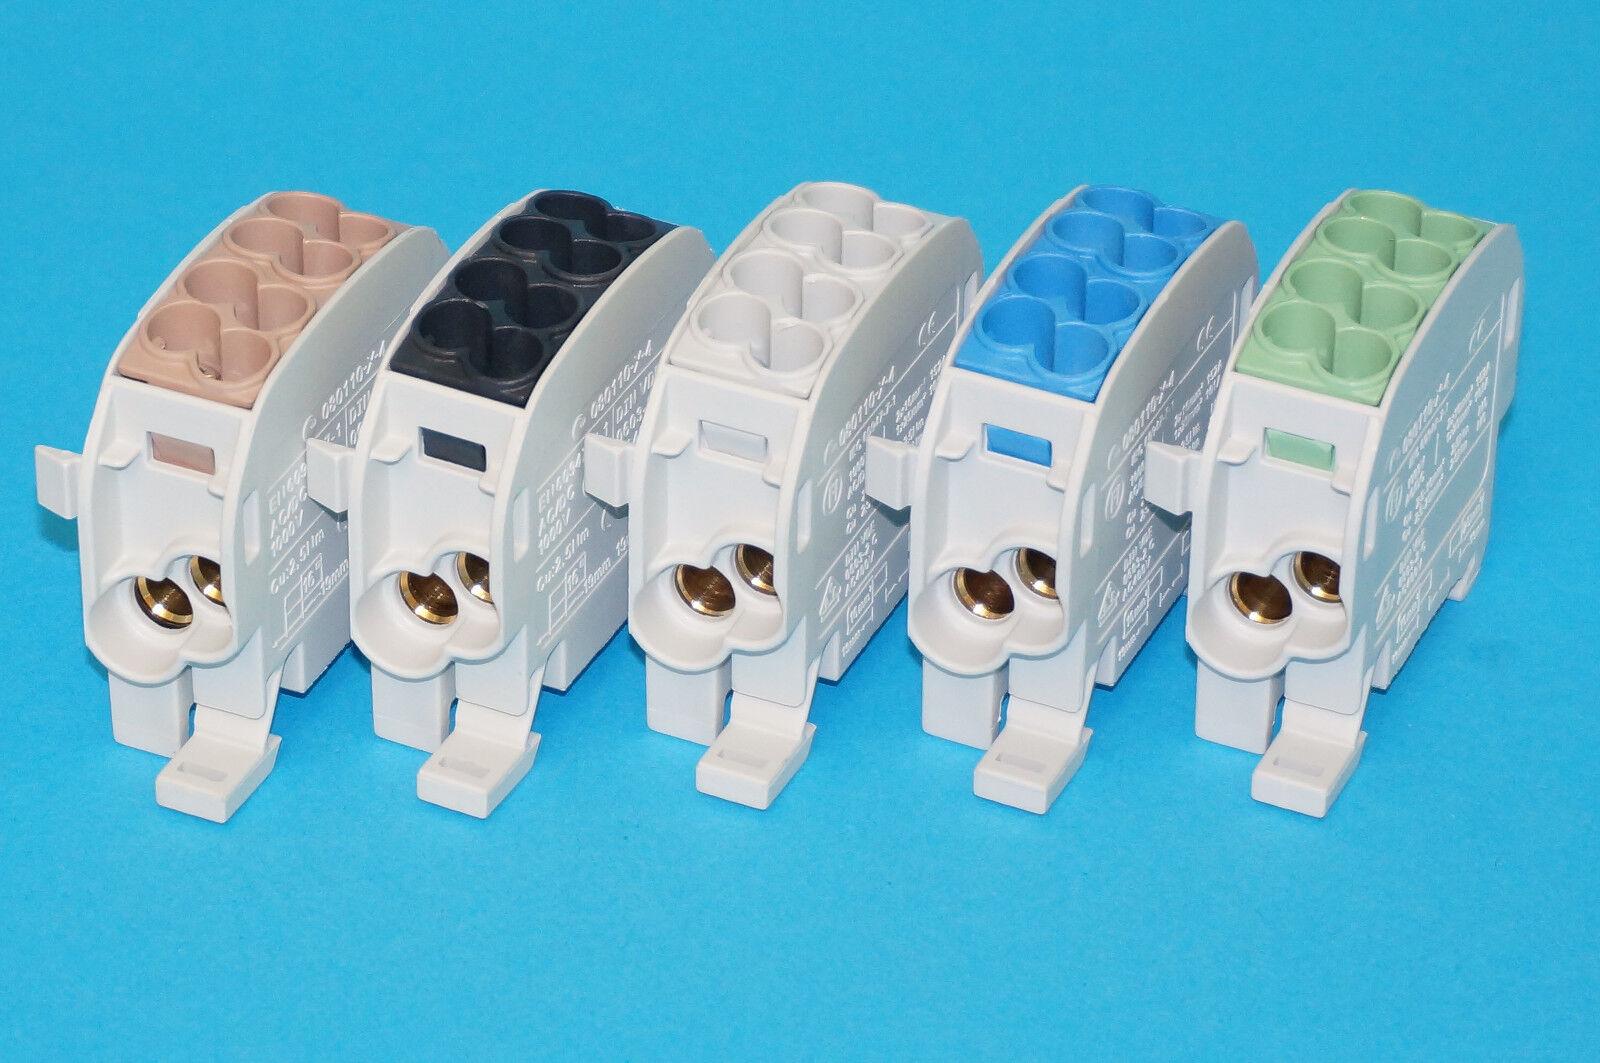 Hauptleitungsklemme Abzweigklemme Anschlußklemme L/N/PE 2,5 - 25 mm² zur Auswahl